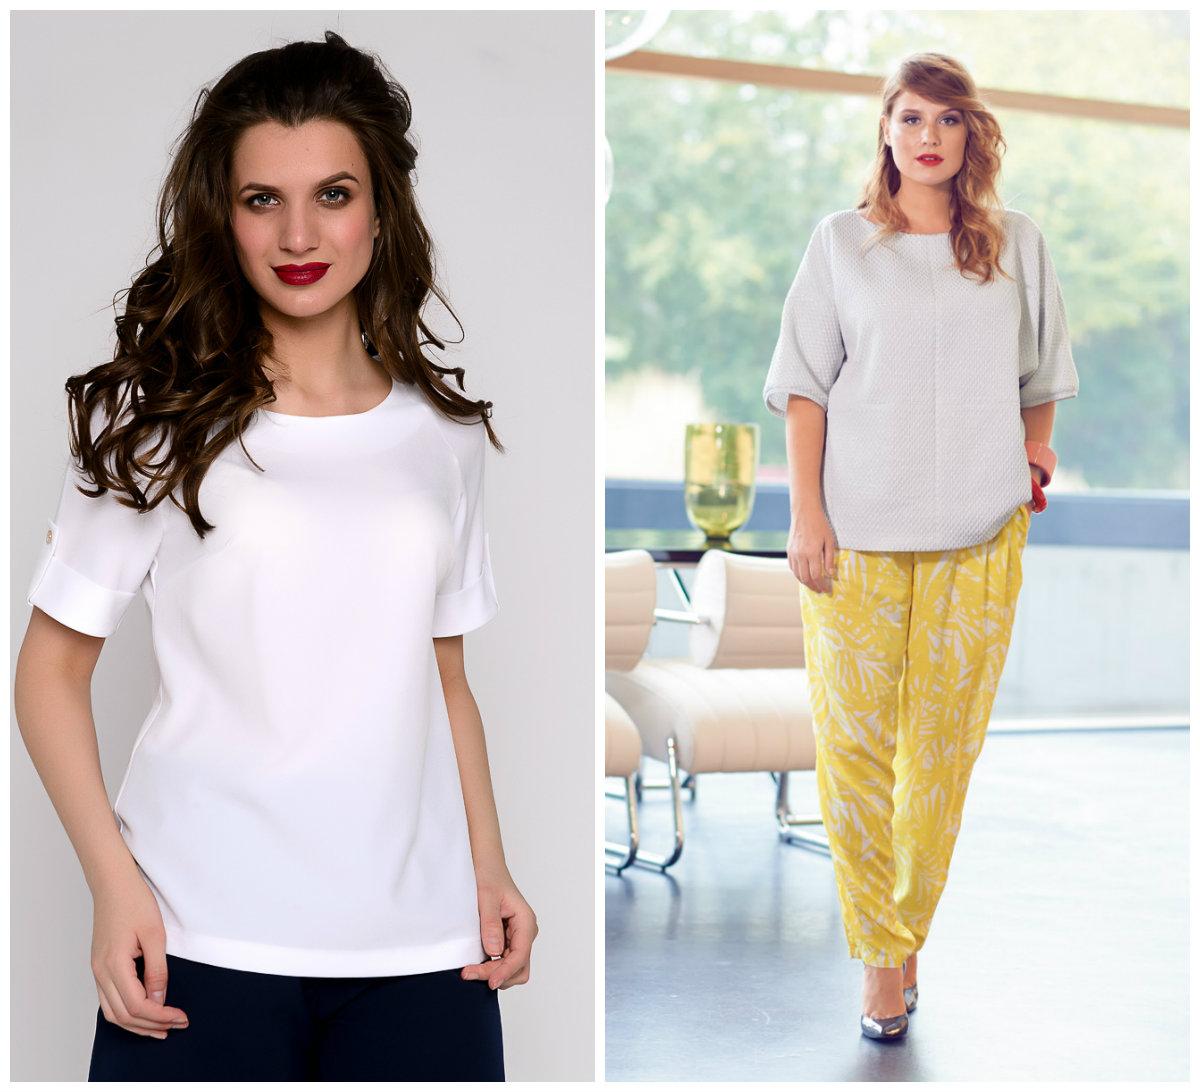 Женские-блузки-2018-романтика-Фото-белый-классика-Модные блузки 2018 женские-Женские блузки 2018